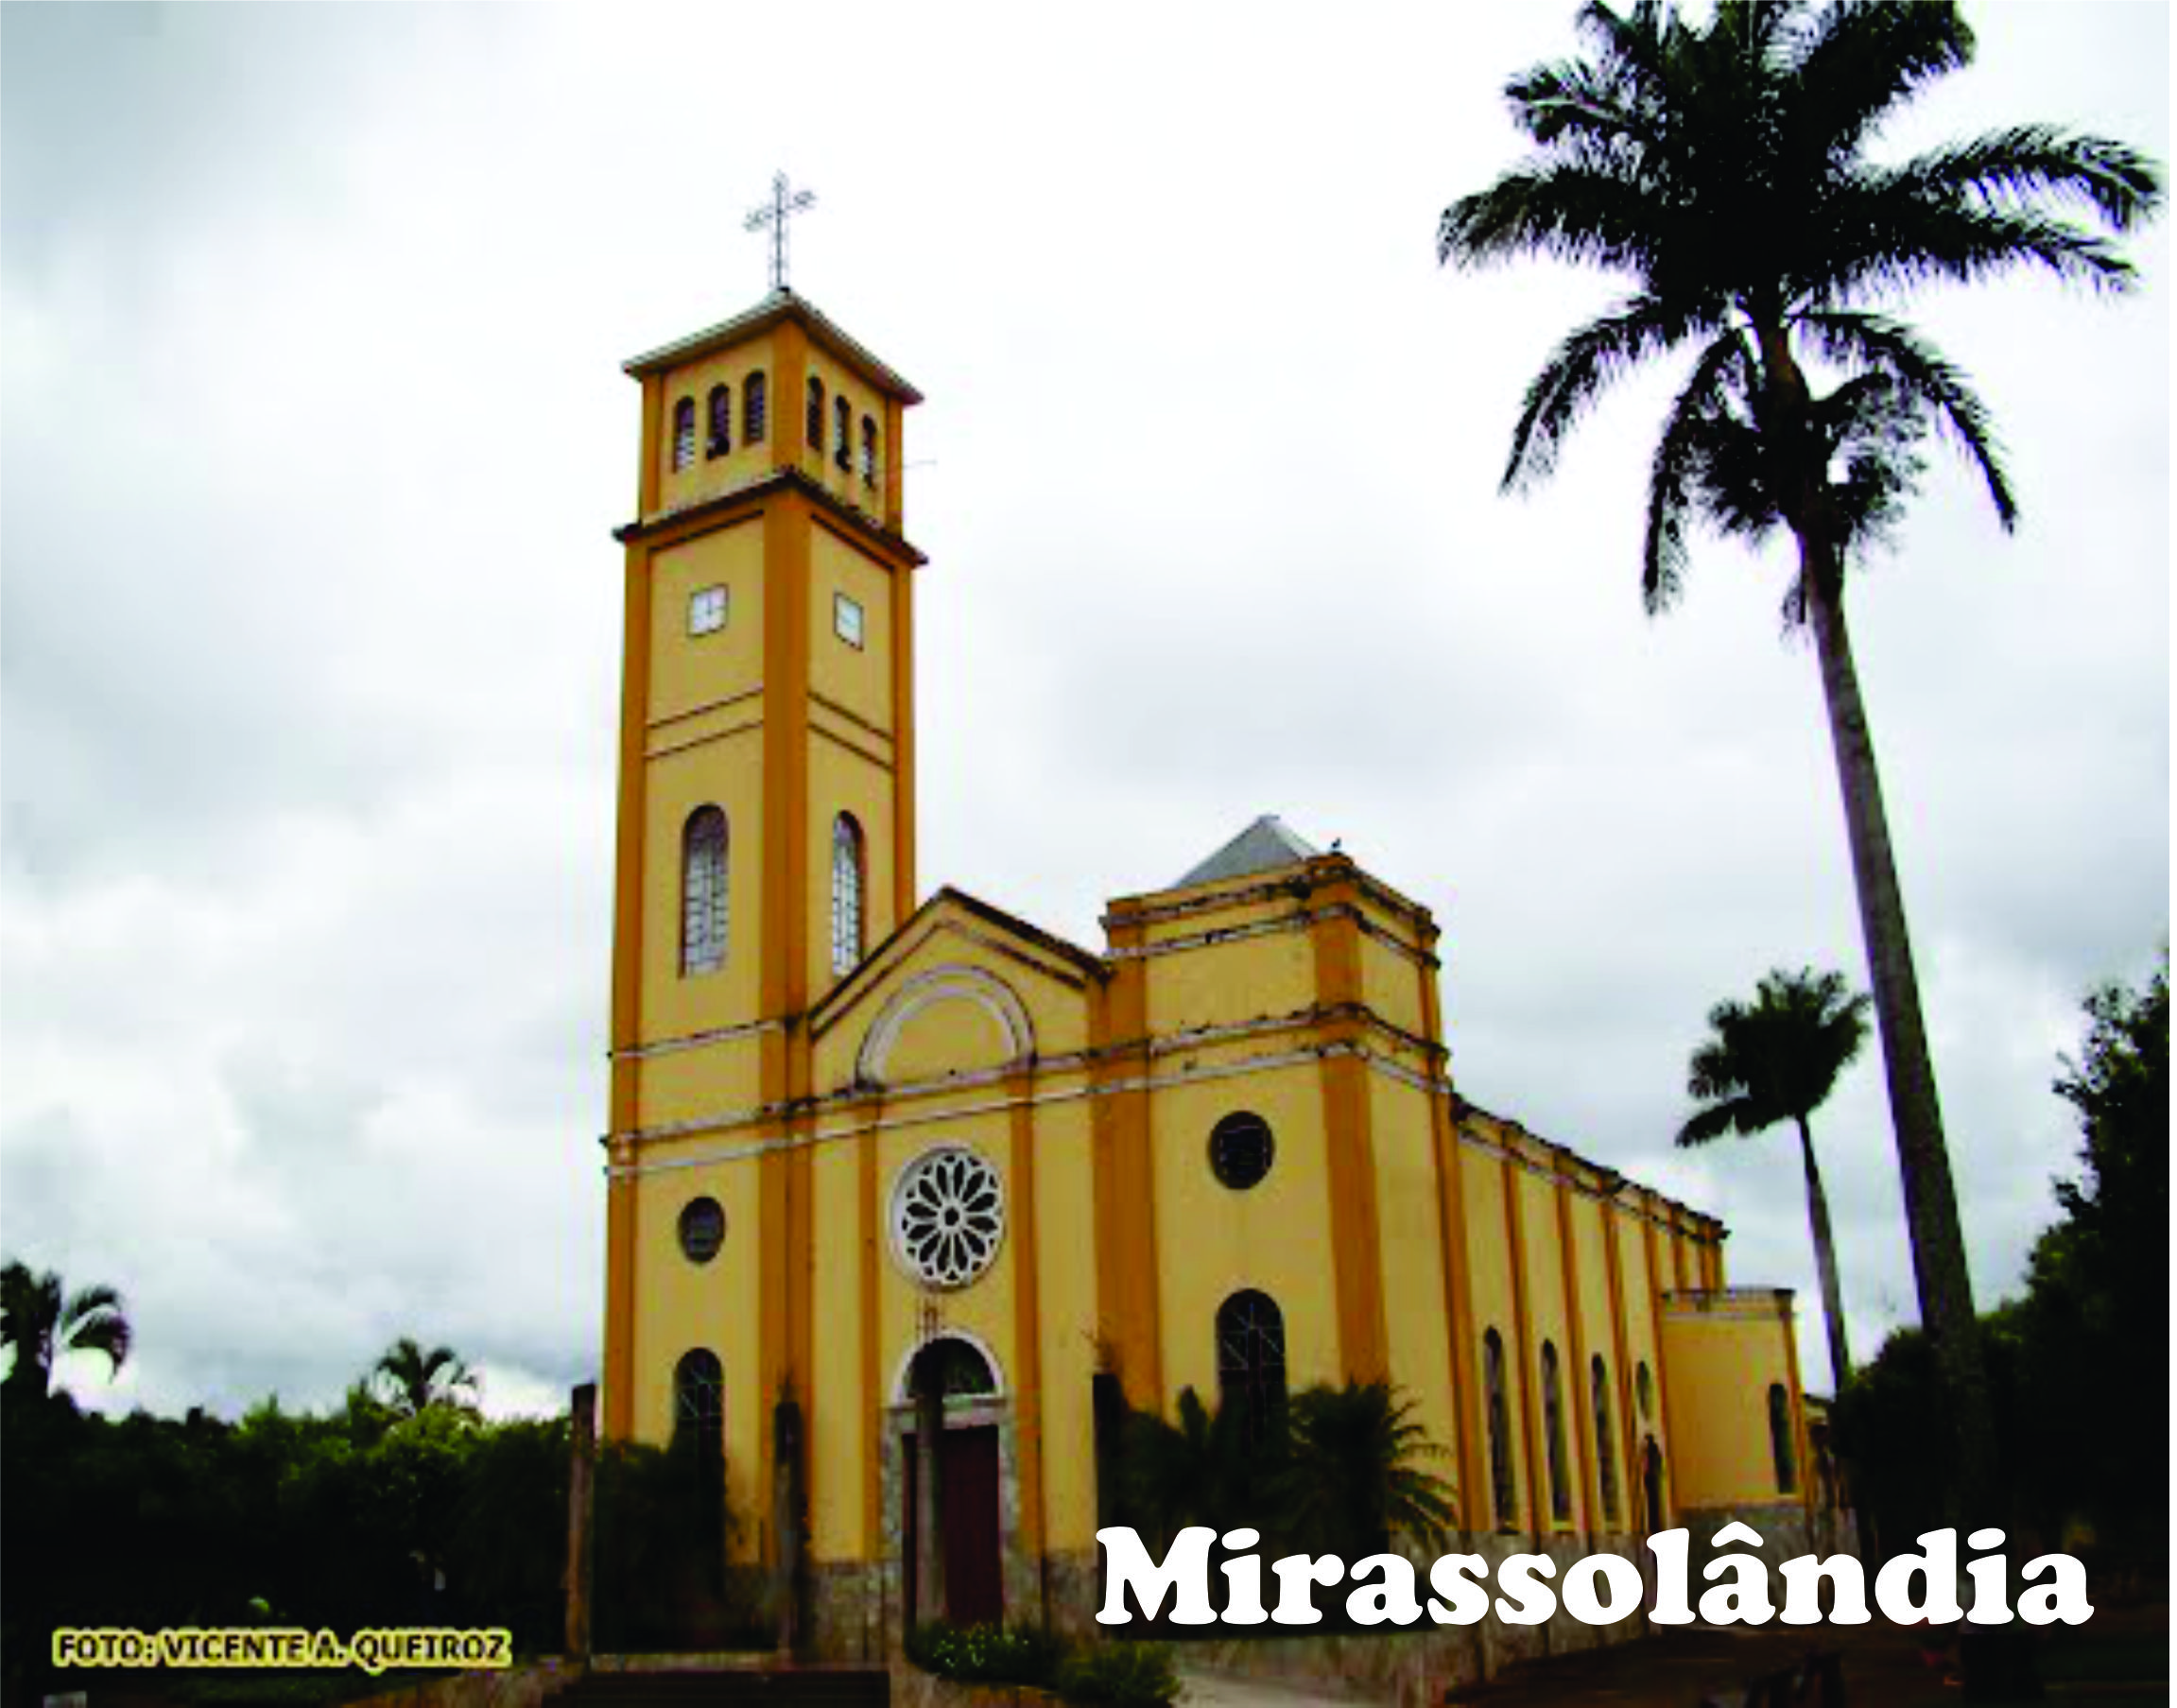 MIRASSOLANDIA